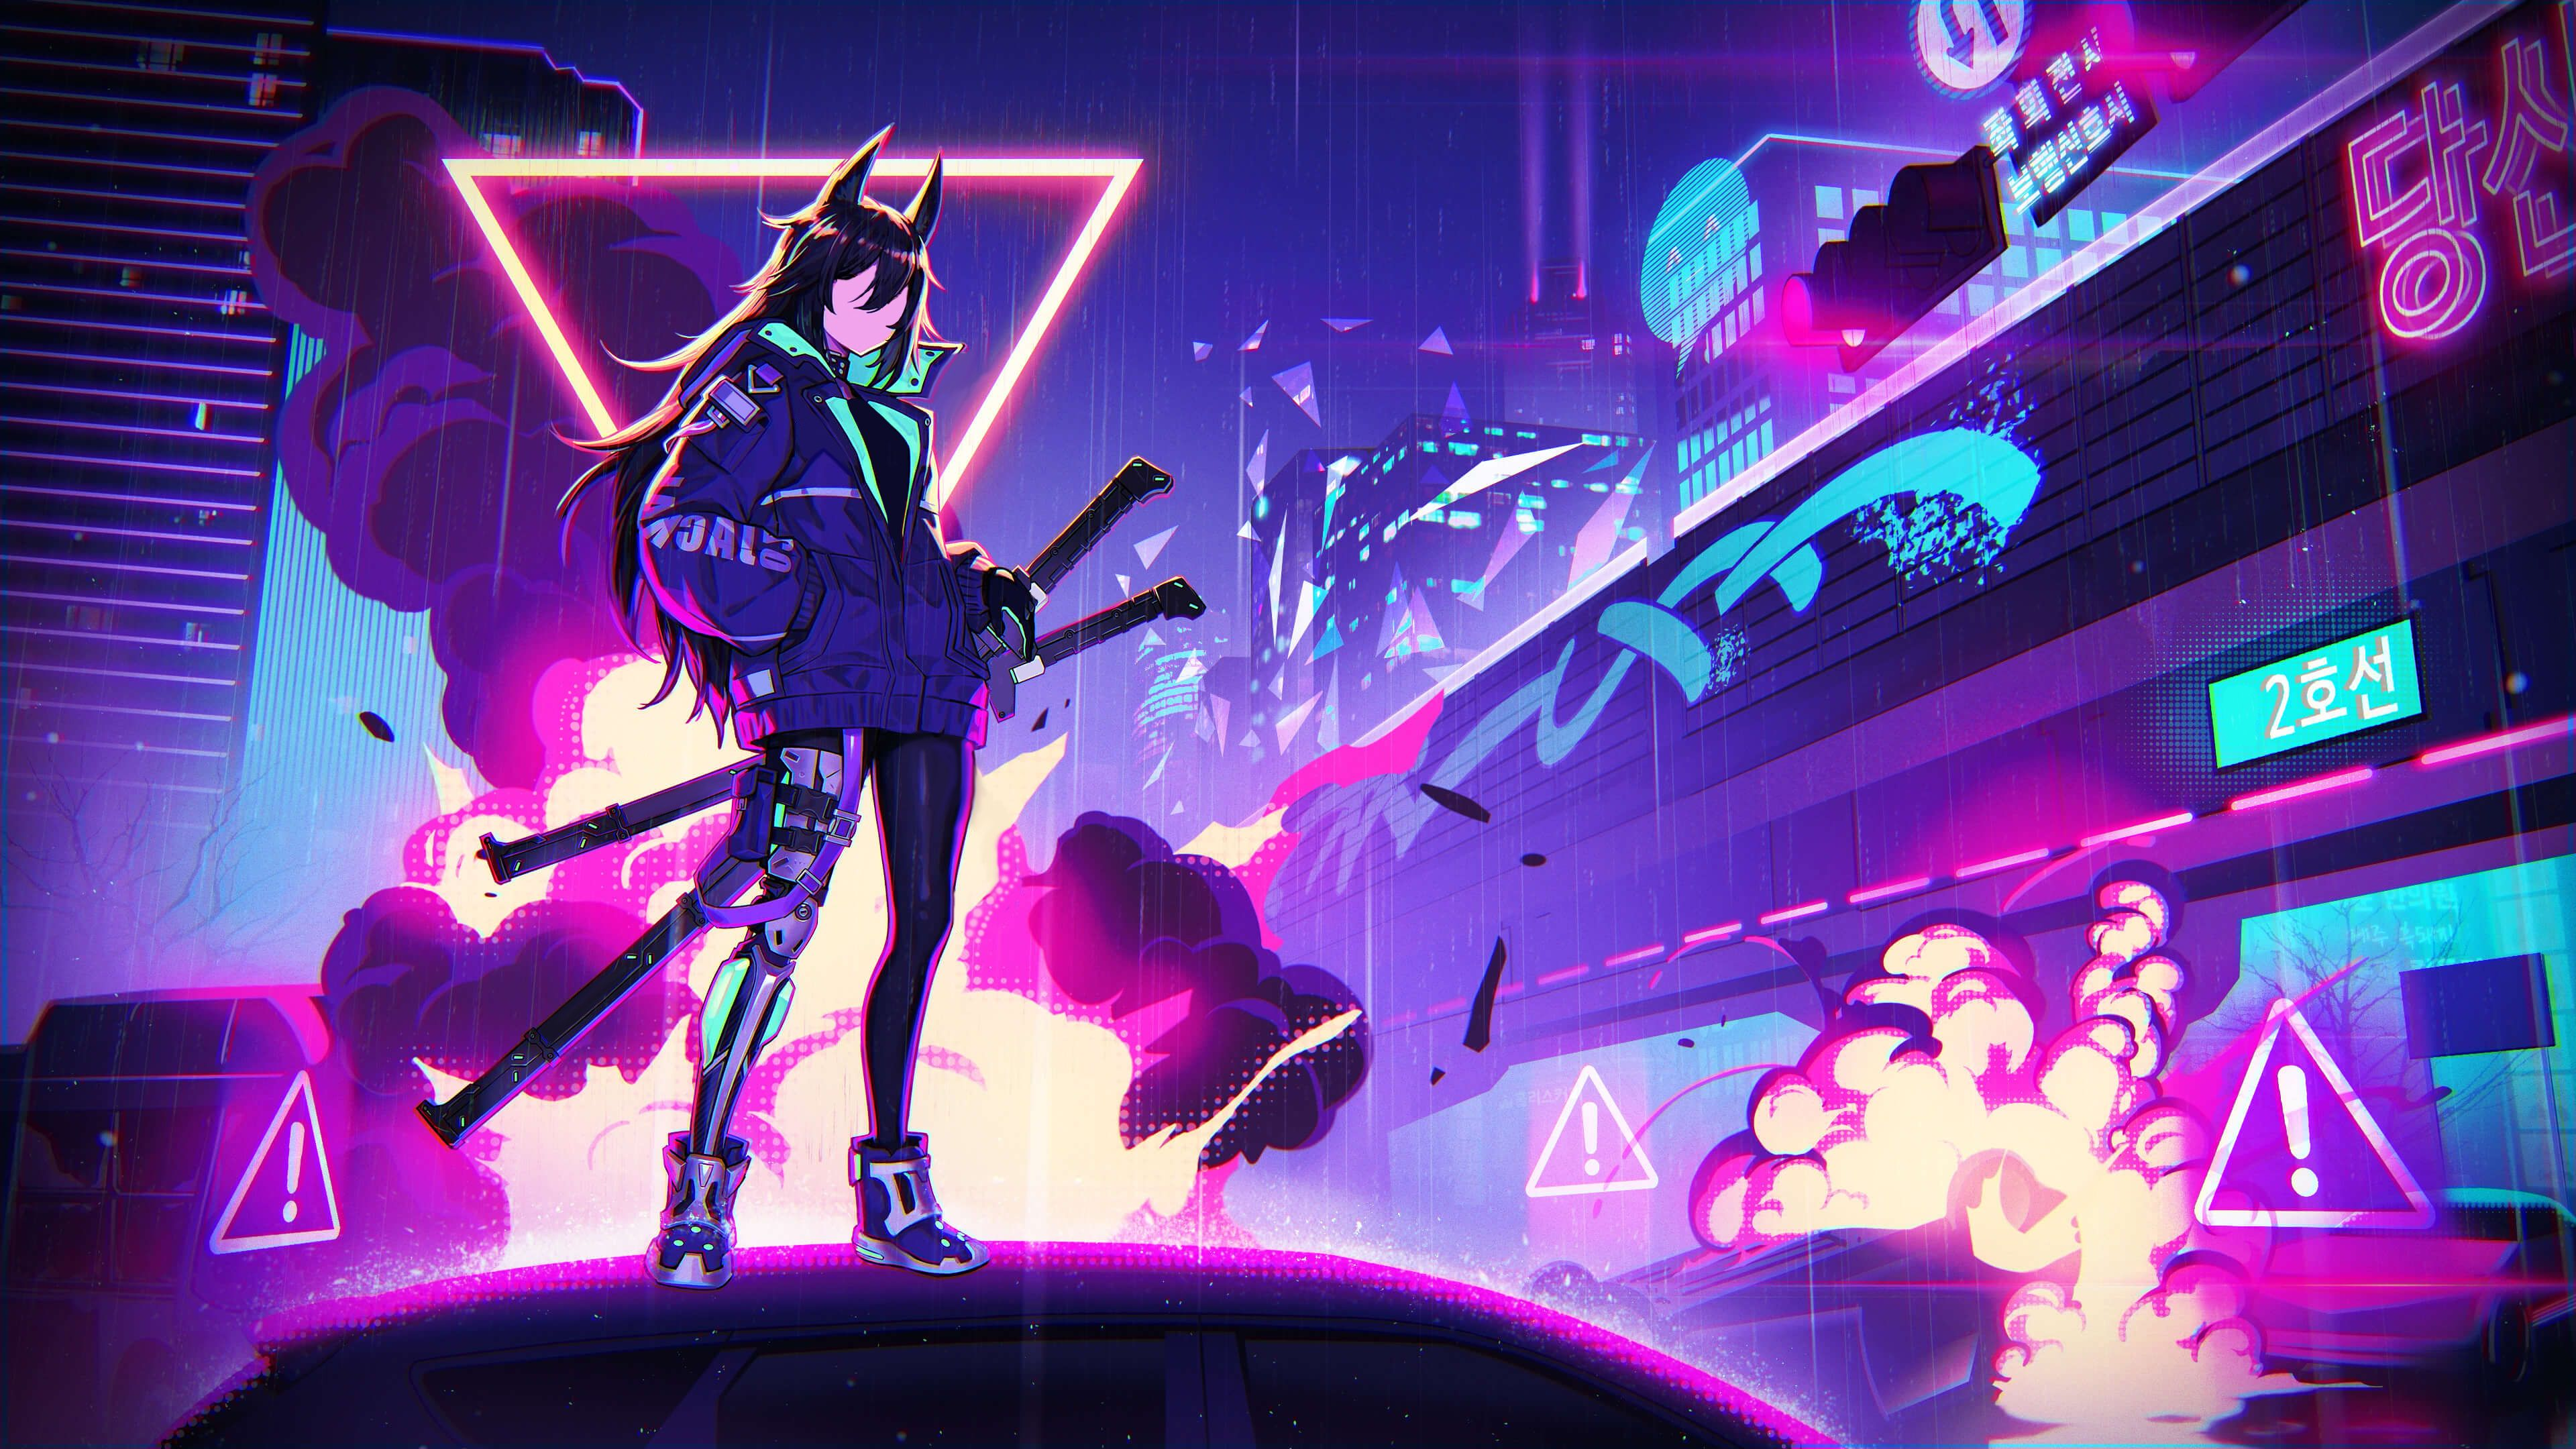 Desktop Background 4k In 2021 Anime Wallpaper 3840x2160 Wallpaper Cyberpunk Anime Anime live wallpaper windows 81